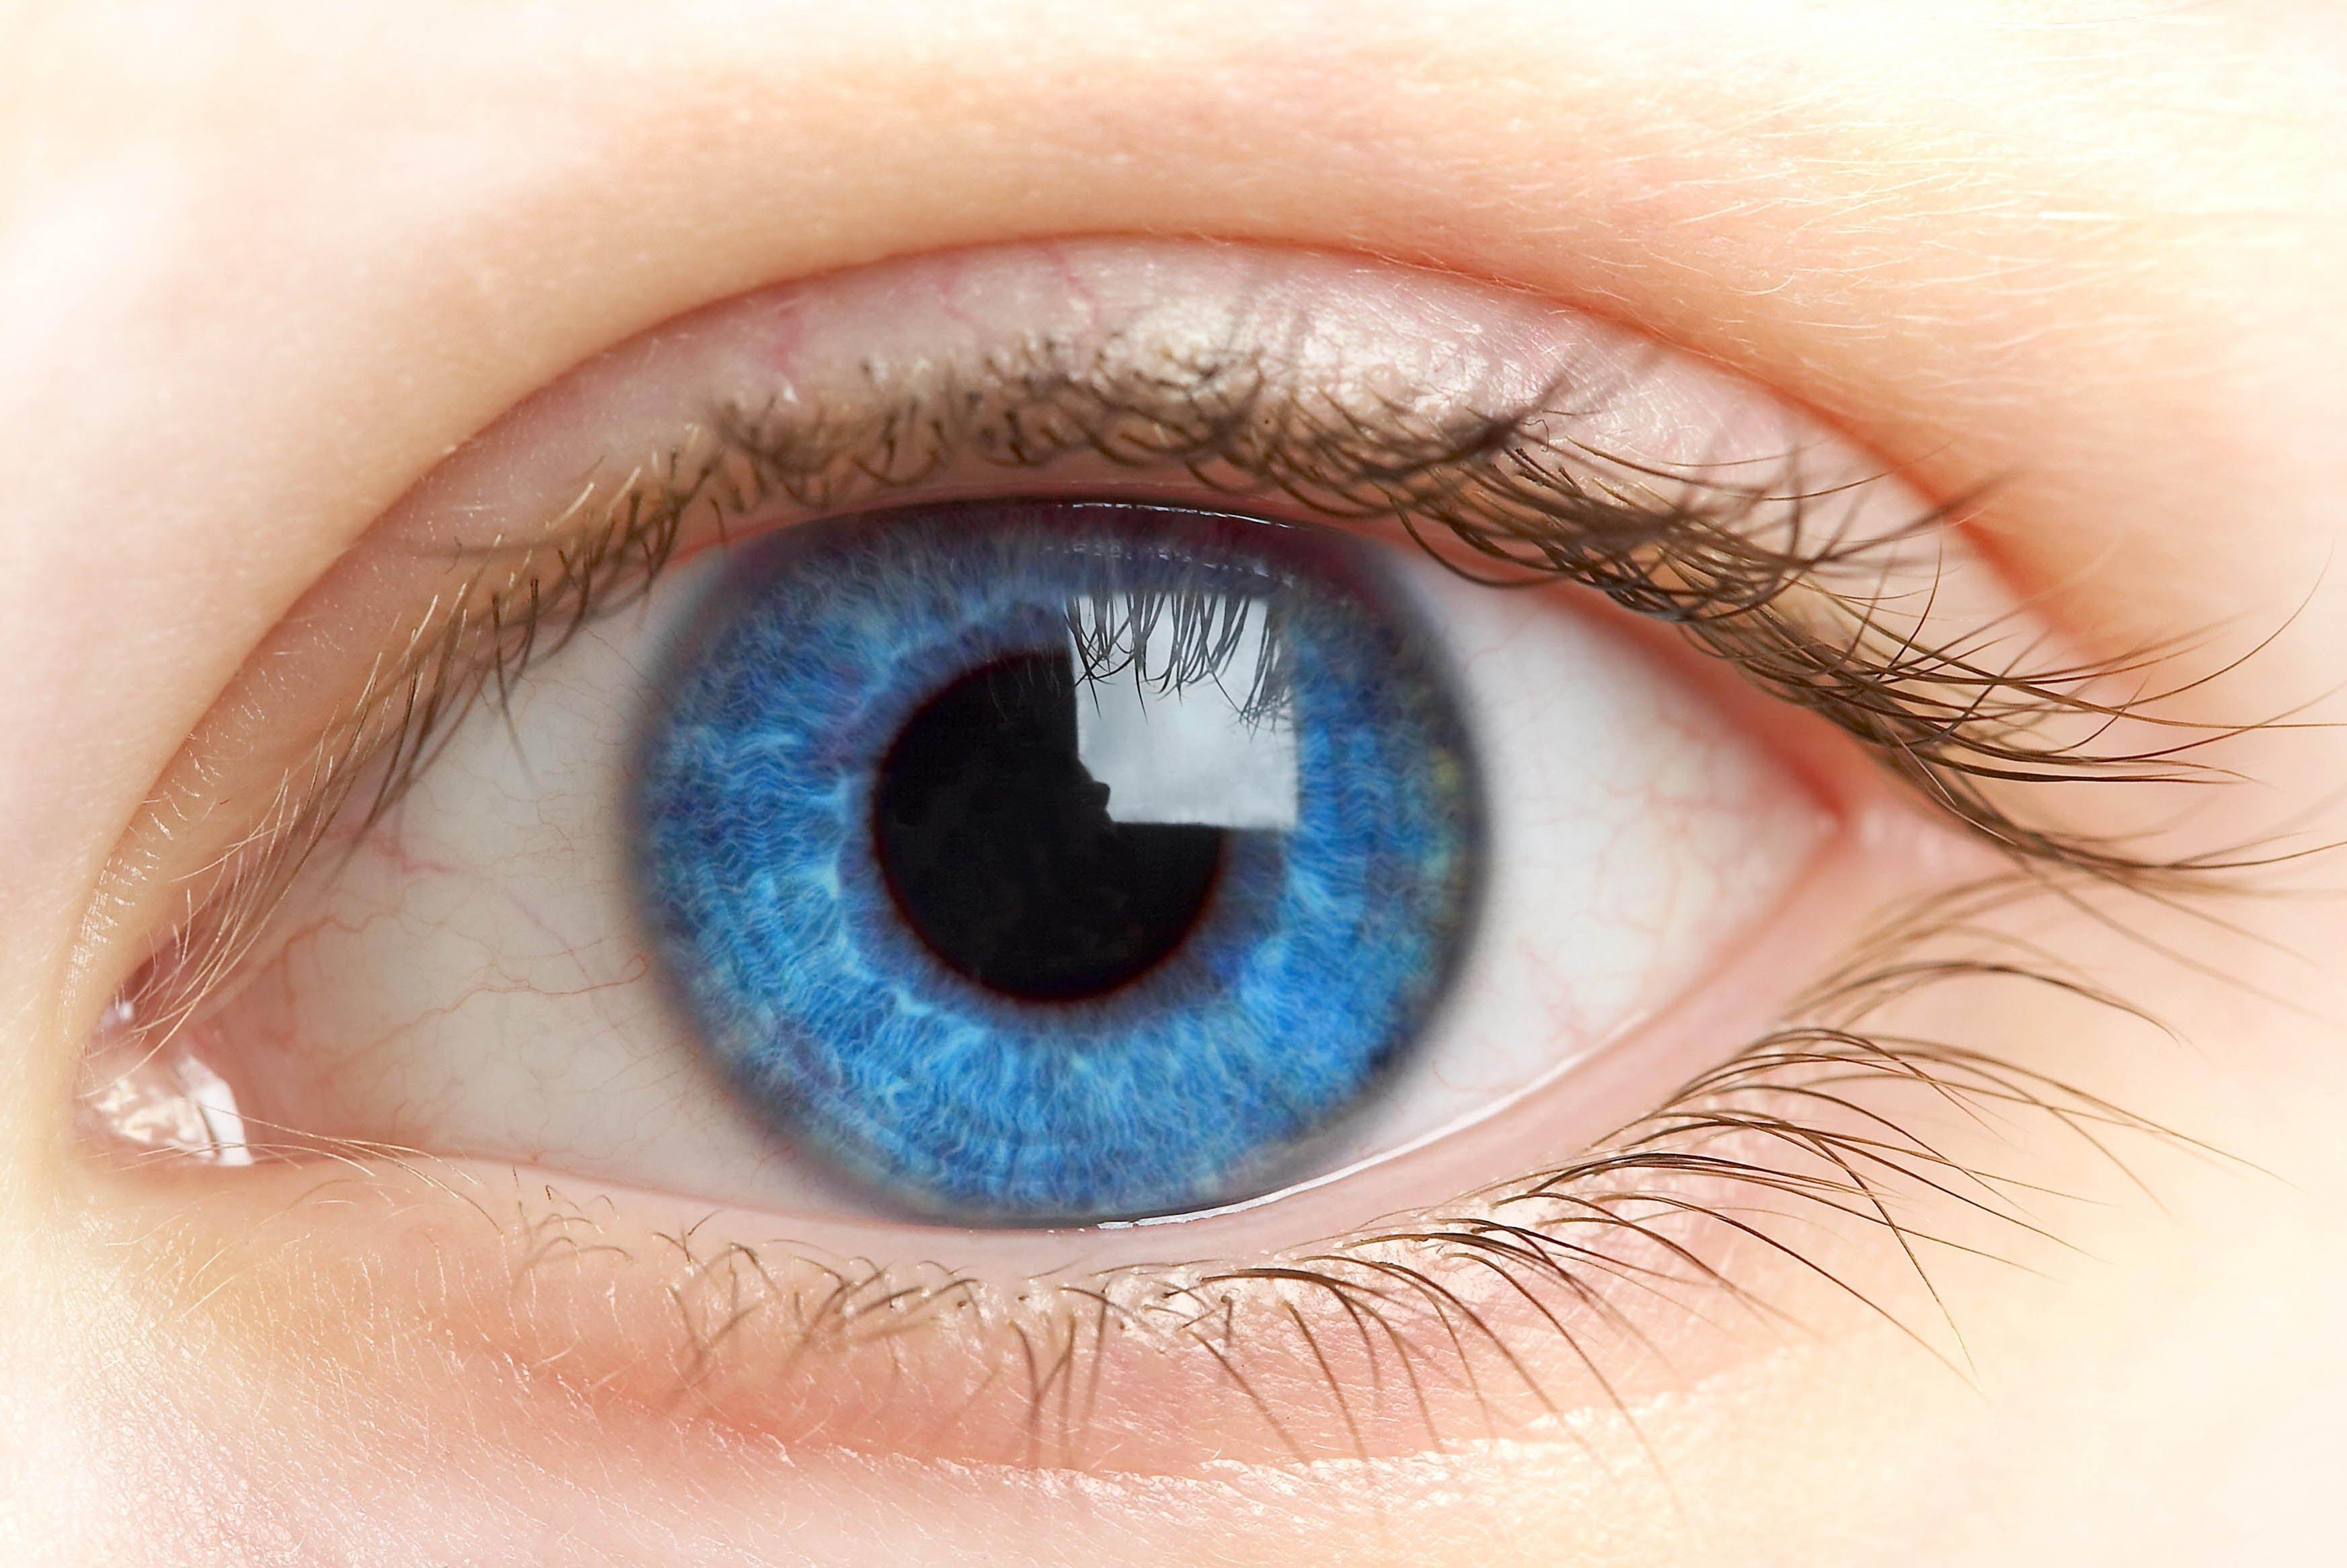 3490x2332 Tutorial How To Draw A Human Eye anatomyampexplanation.